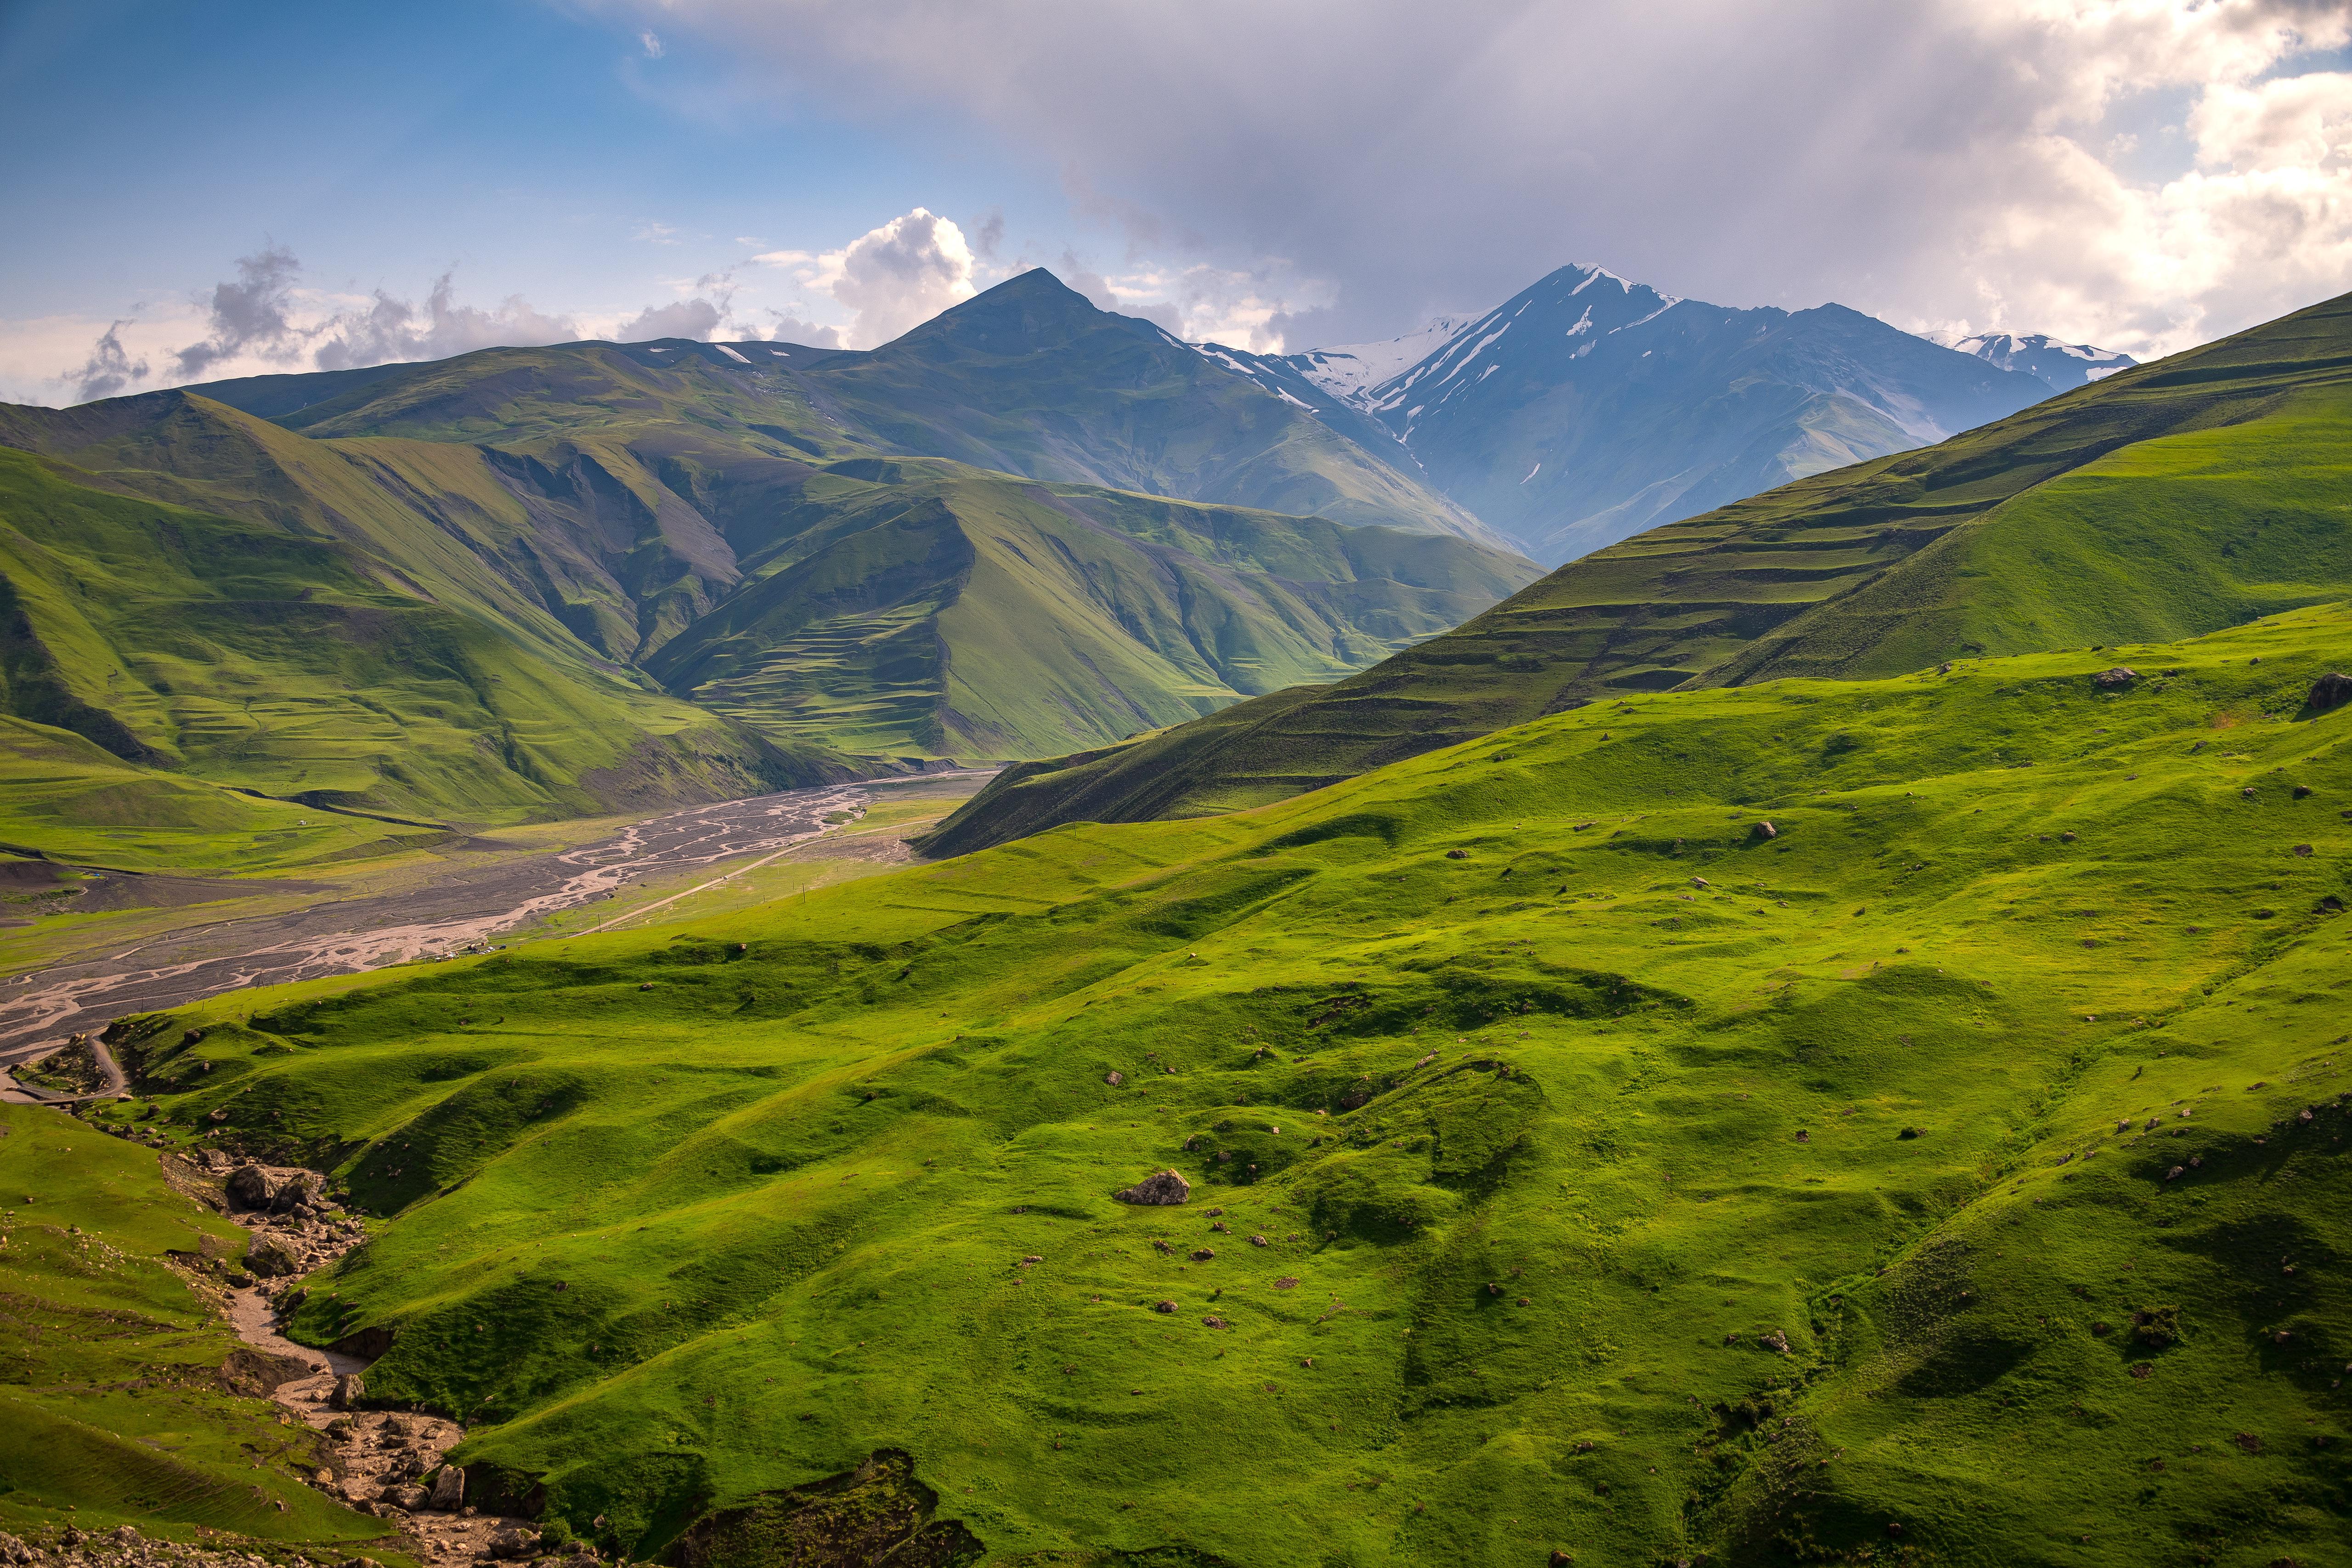 Montagnes Azerbaijan, Quba Nuage montagne Nature